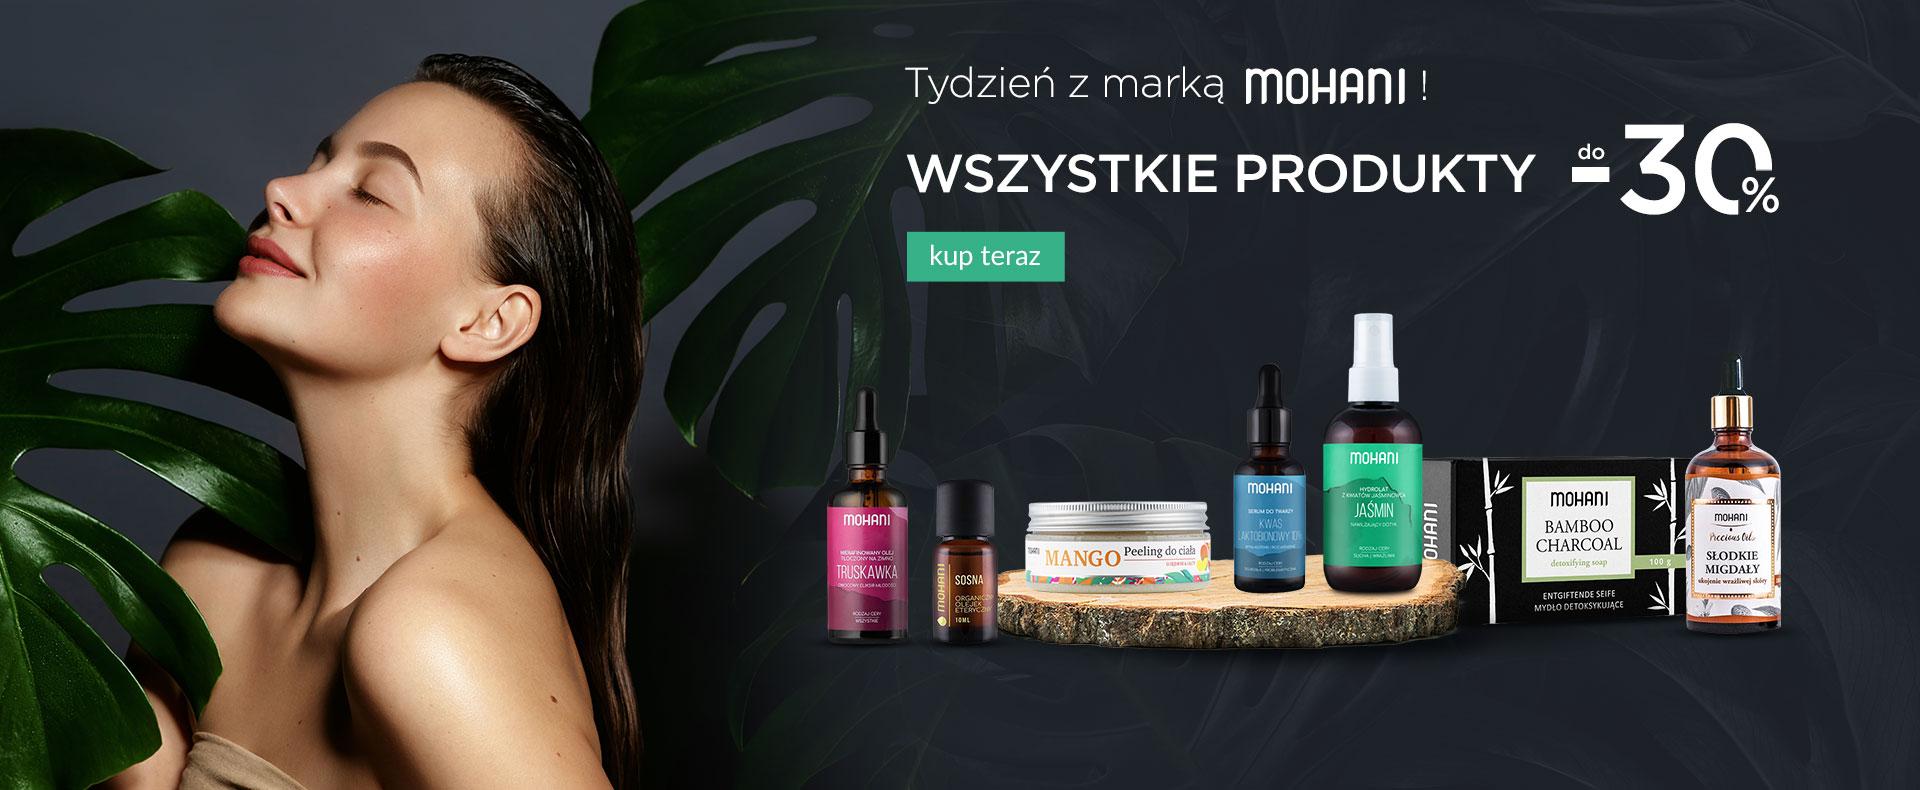 Ezebra: do 30% rabatu na kosmetyki marki Mohani